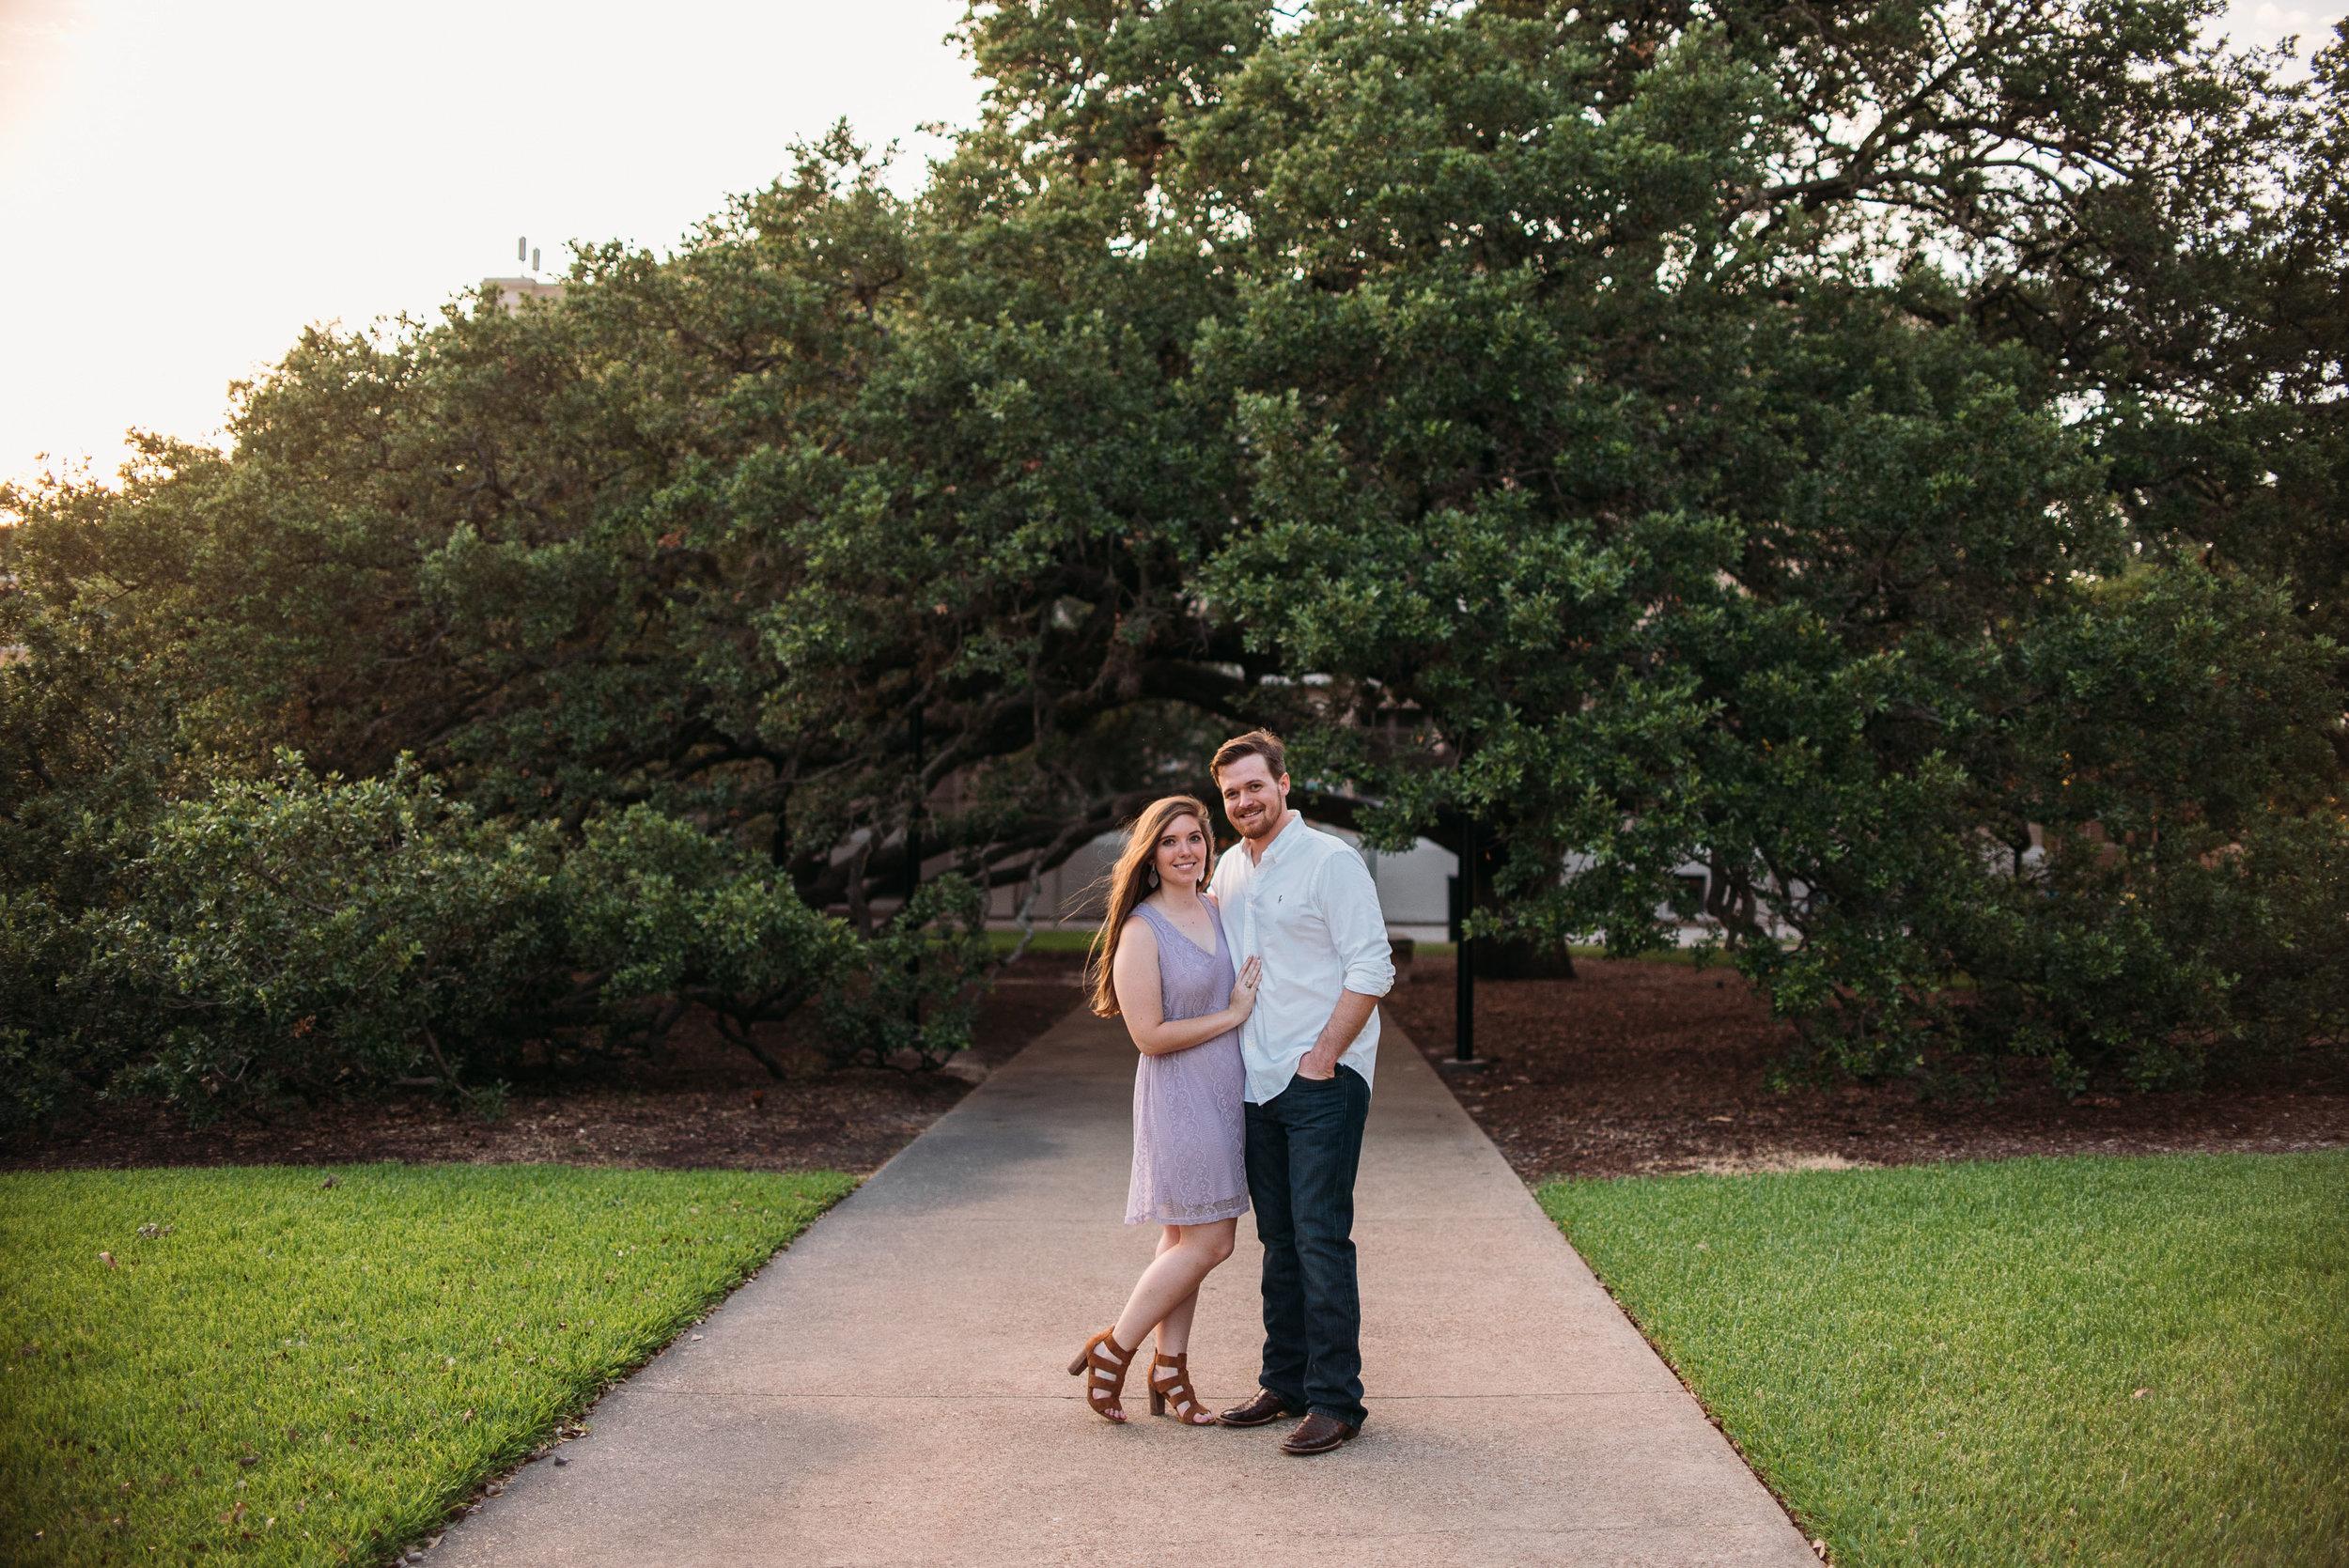 Texas-A&M-University-Engagement-College-Station-Wedding-Photographer-San-Angel-Photo-Mark-Johanna-Century-Tree-25.jpg